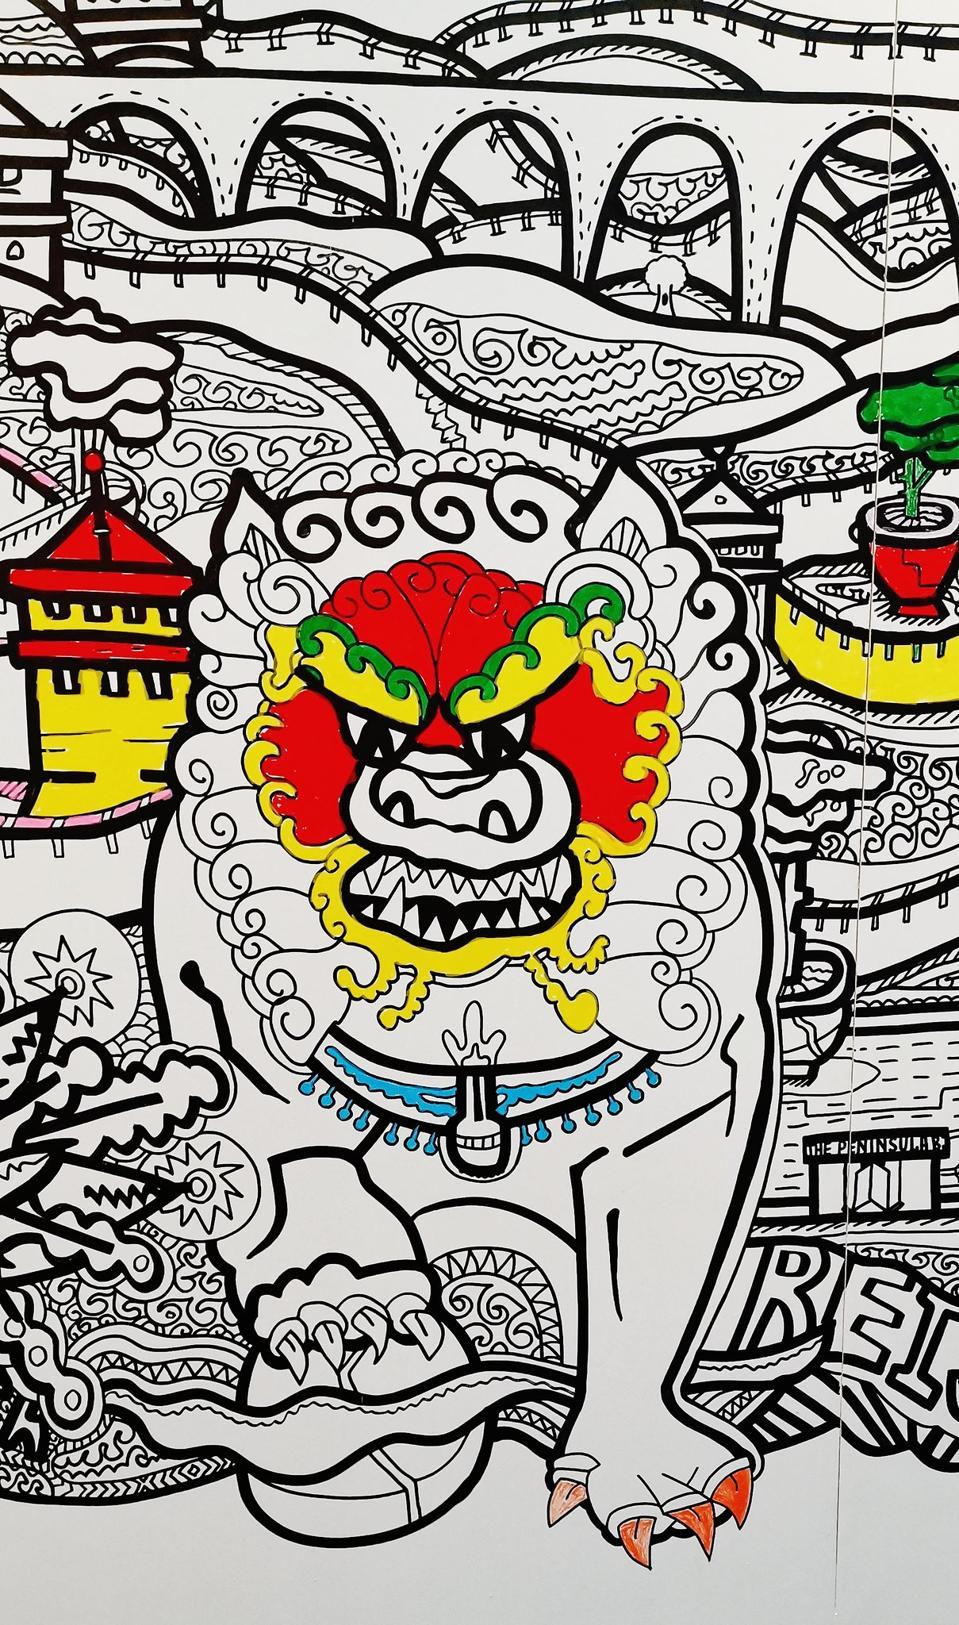 Great Coloring Wall by Max Goshko-Dankov at the Peninsula Art Gallery in Beijing